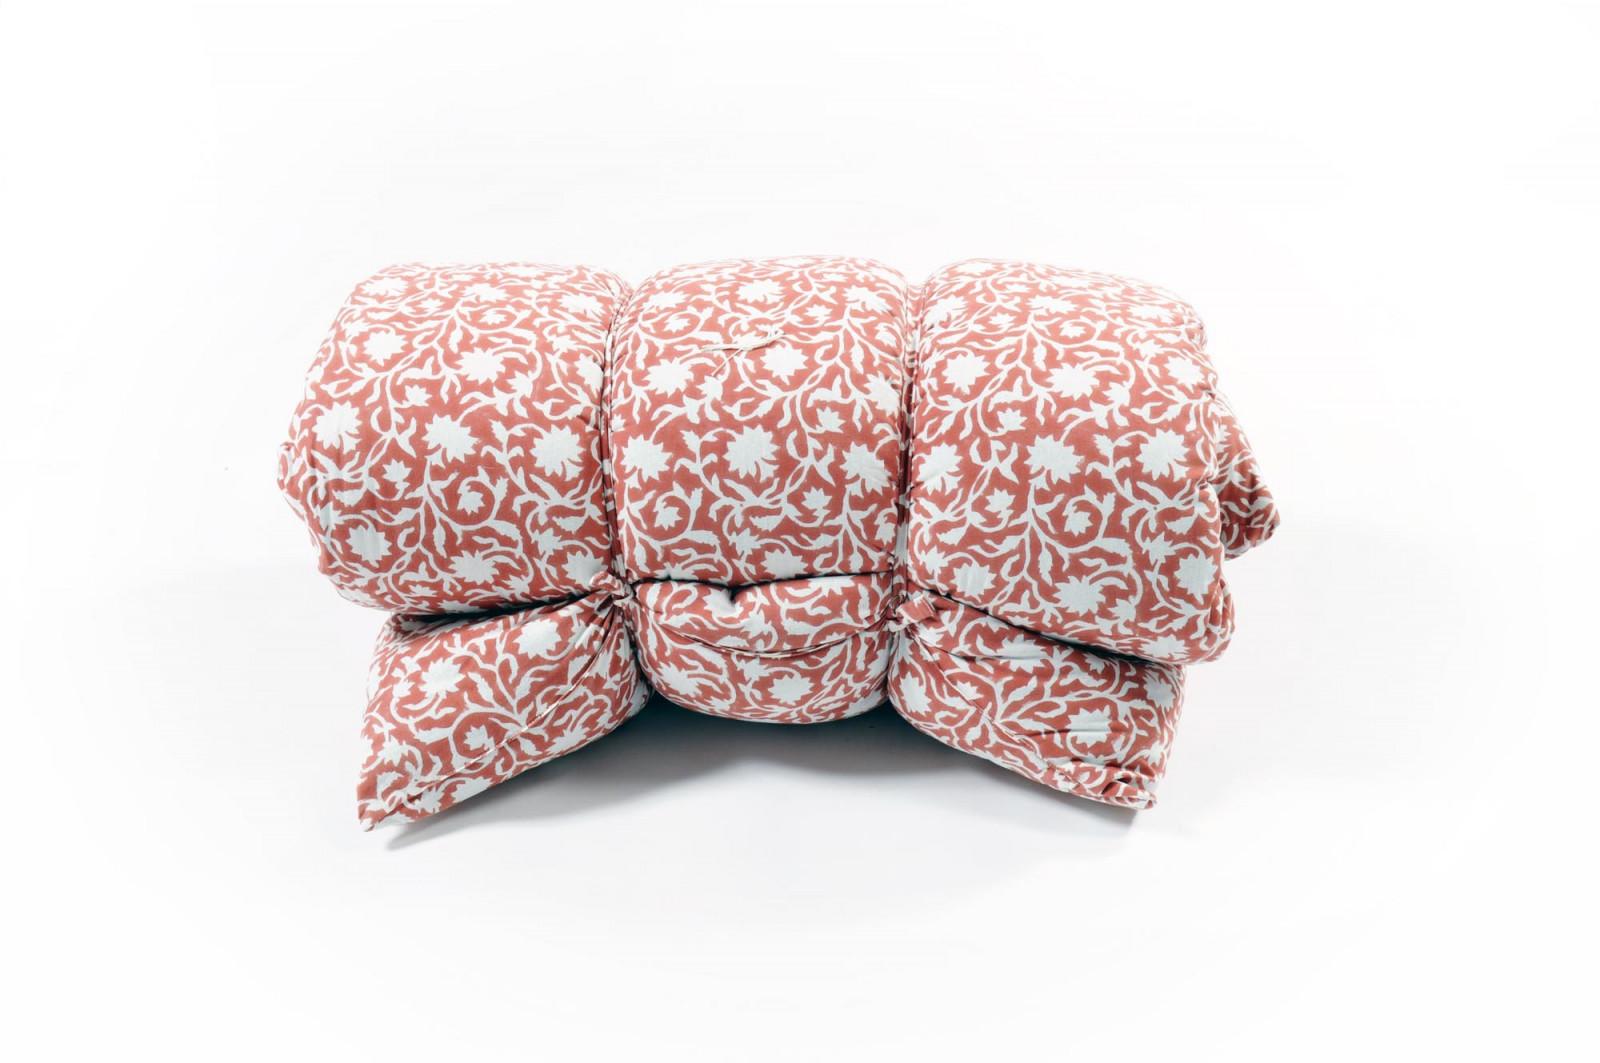 MATELAS FUTON coton 70x180 cm